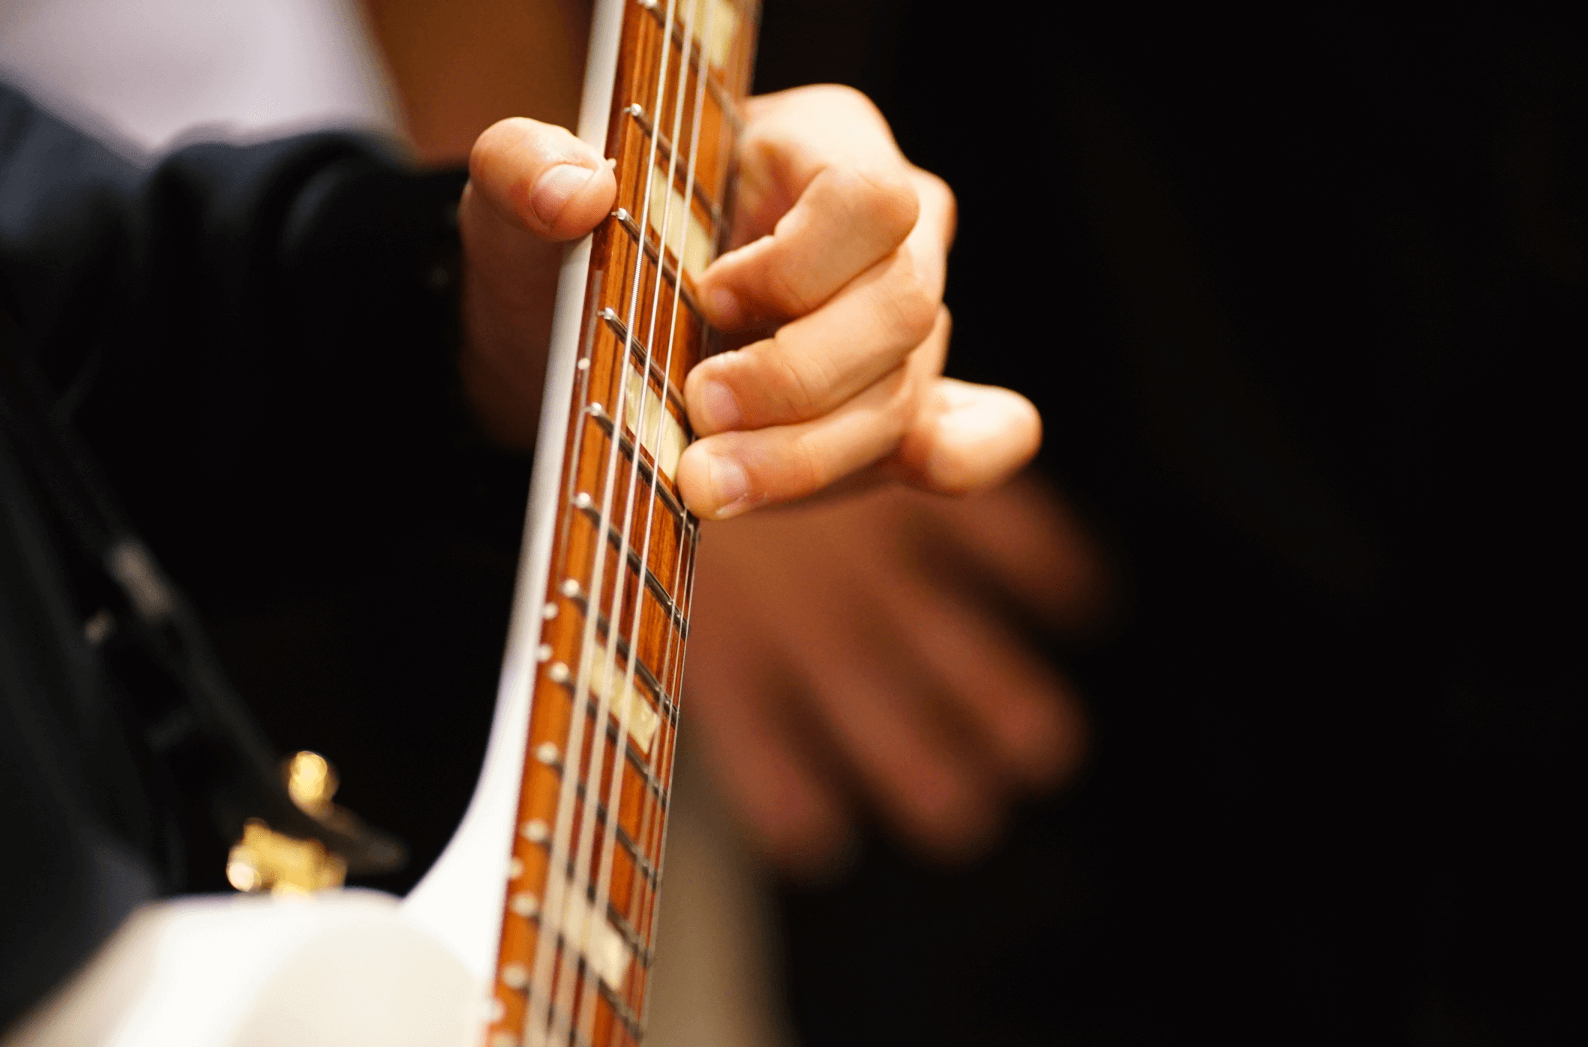 Guitar vibrato hand position